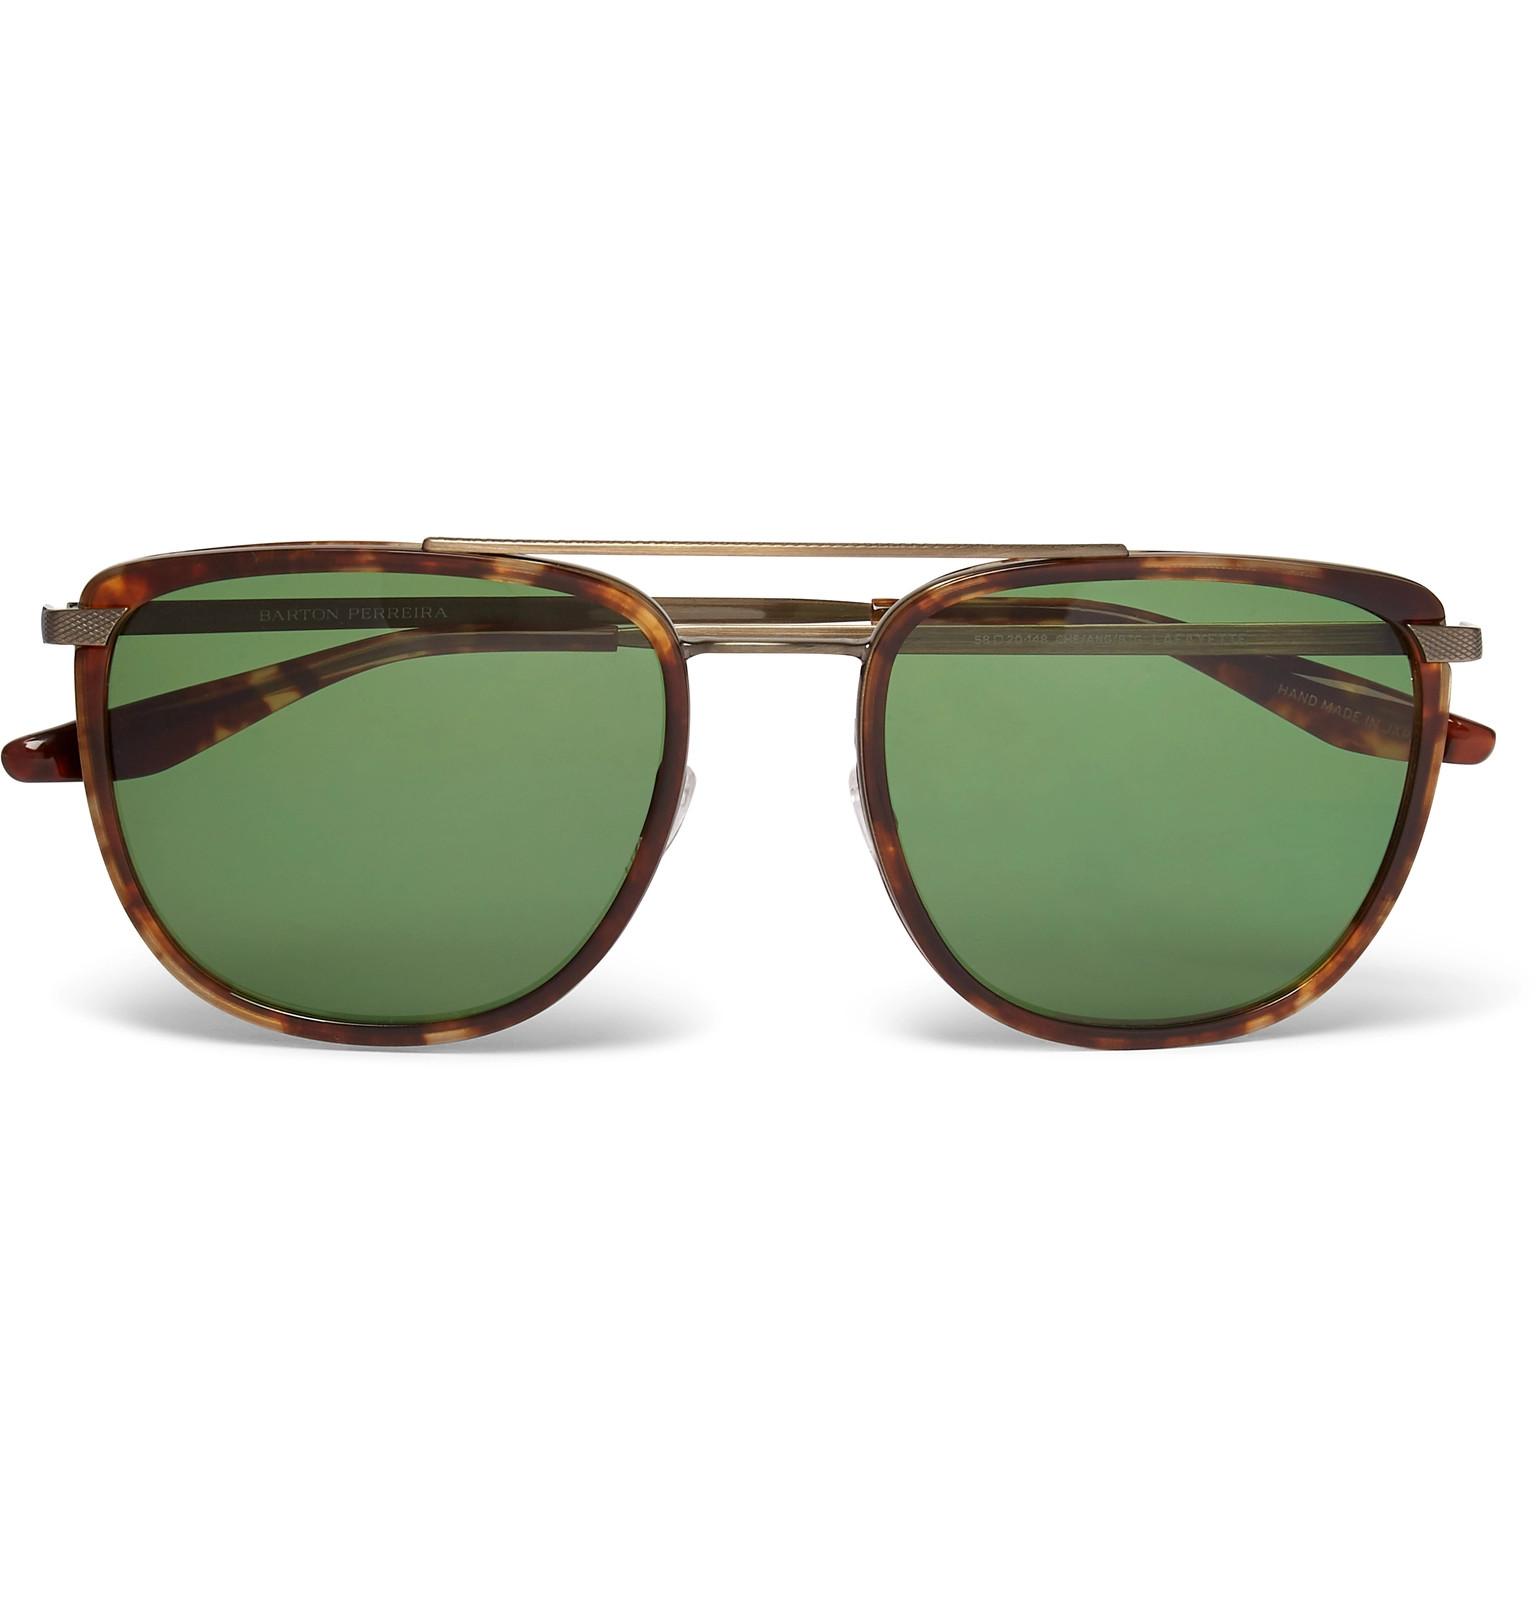 b7cb96e2f14f Barton PerreiraLafayette Aviator-Style Tortoiseshell Acetate and Gold-Tone  Sunglasses